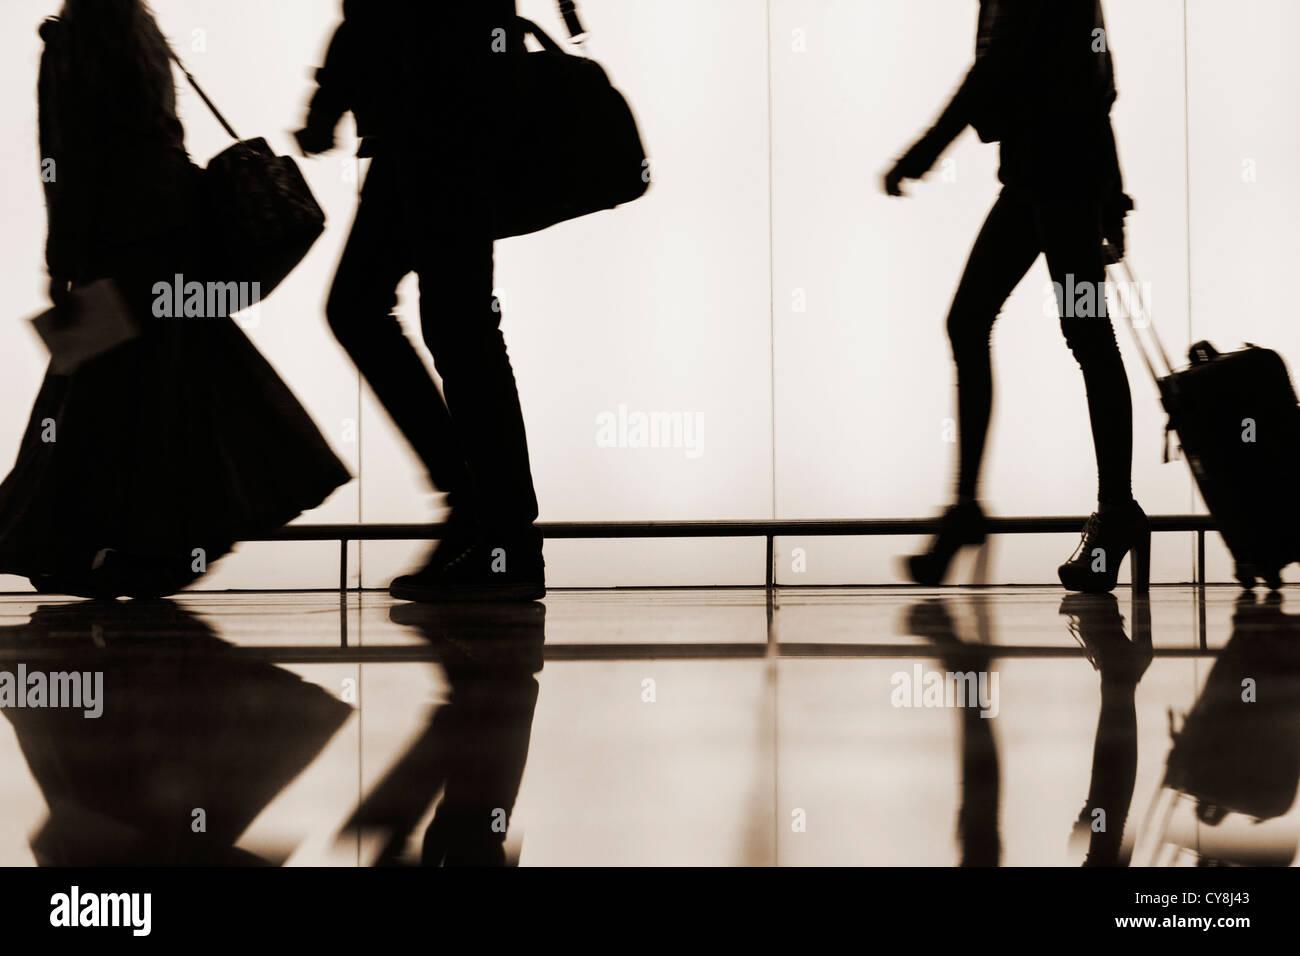 El Prat airport. Barcelona, Spain - Stock Image